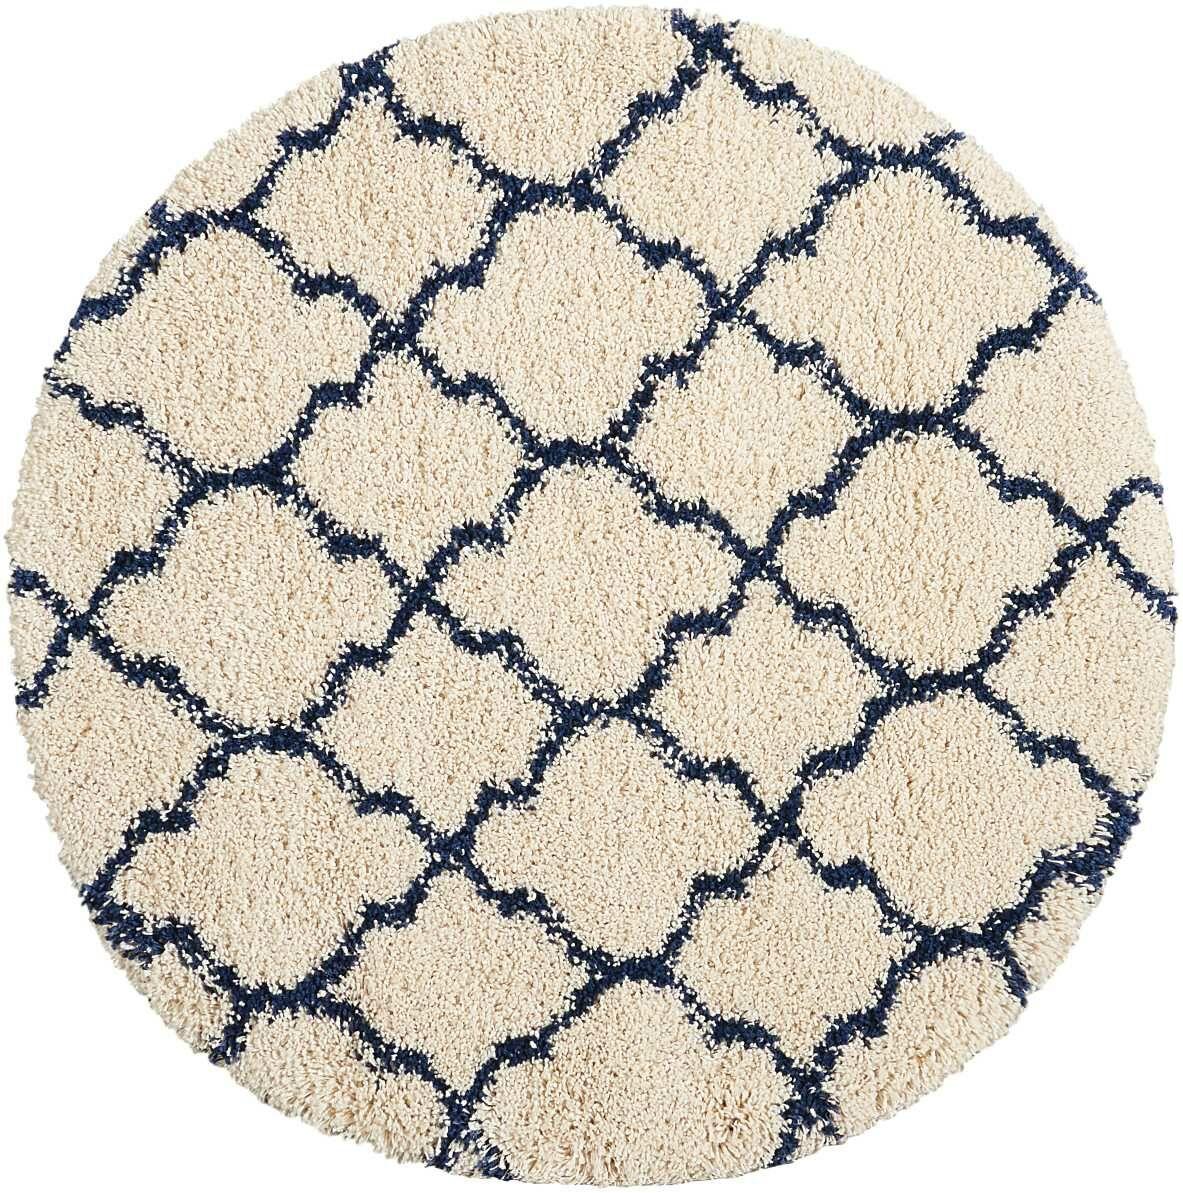 Linton Ivory/Blue Area Rug Rug Size: Round 6'7